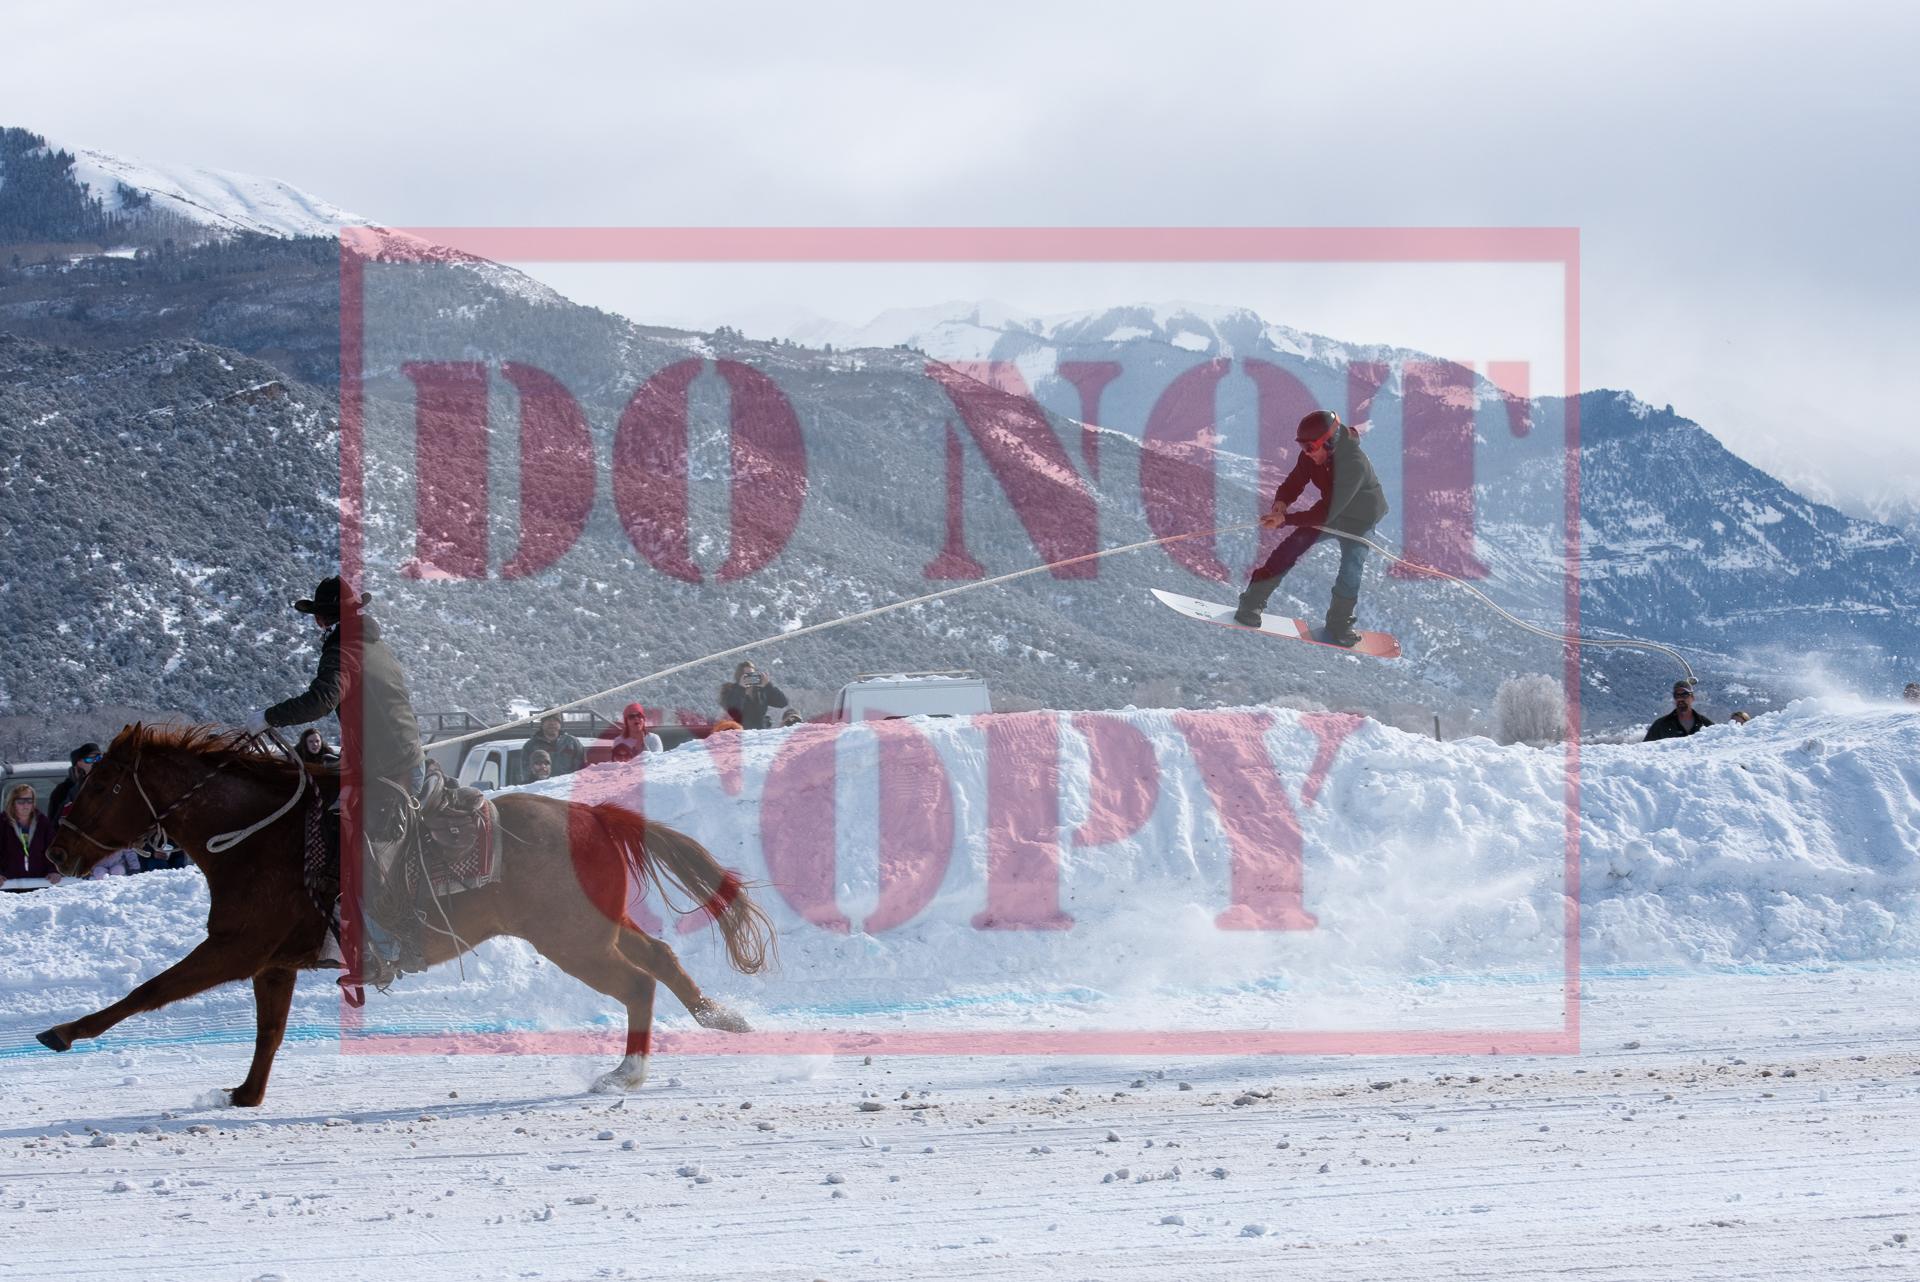 - JW Goode - Snowboard 9